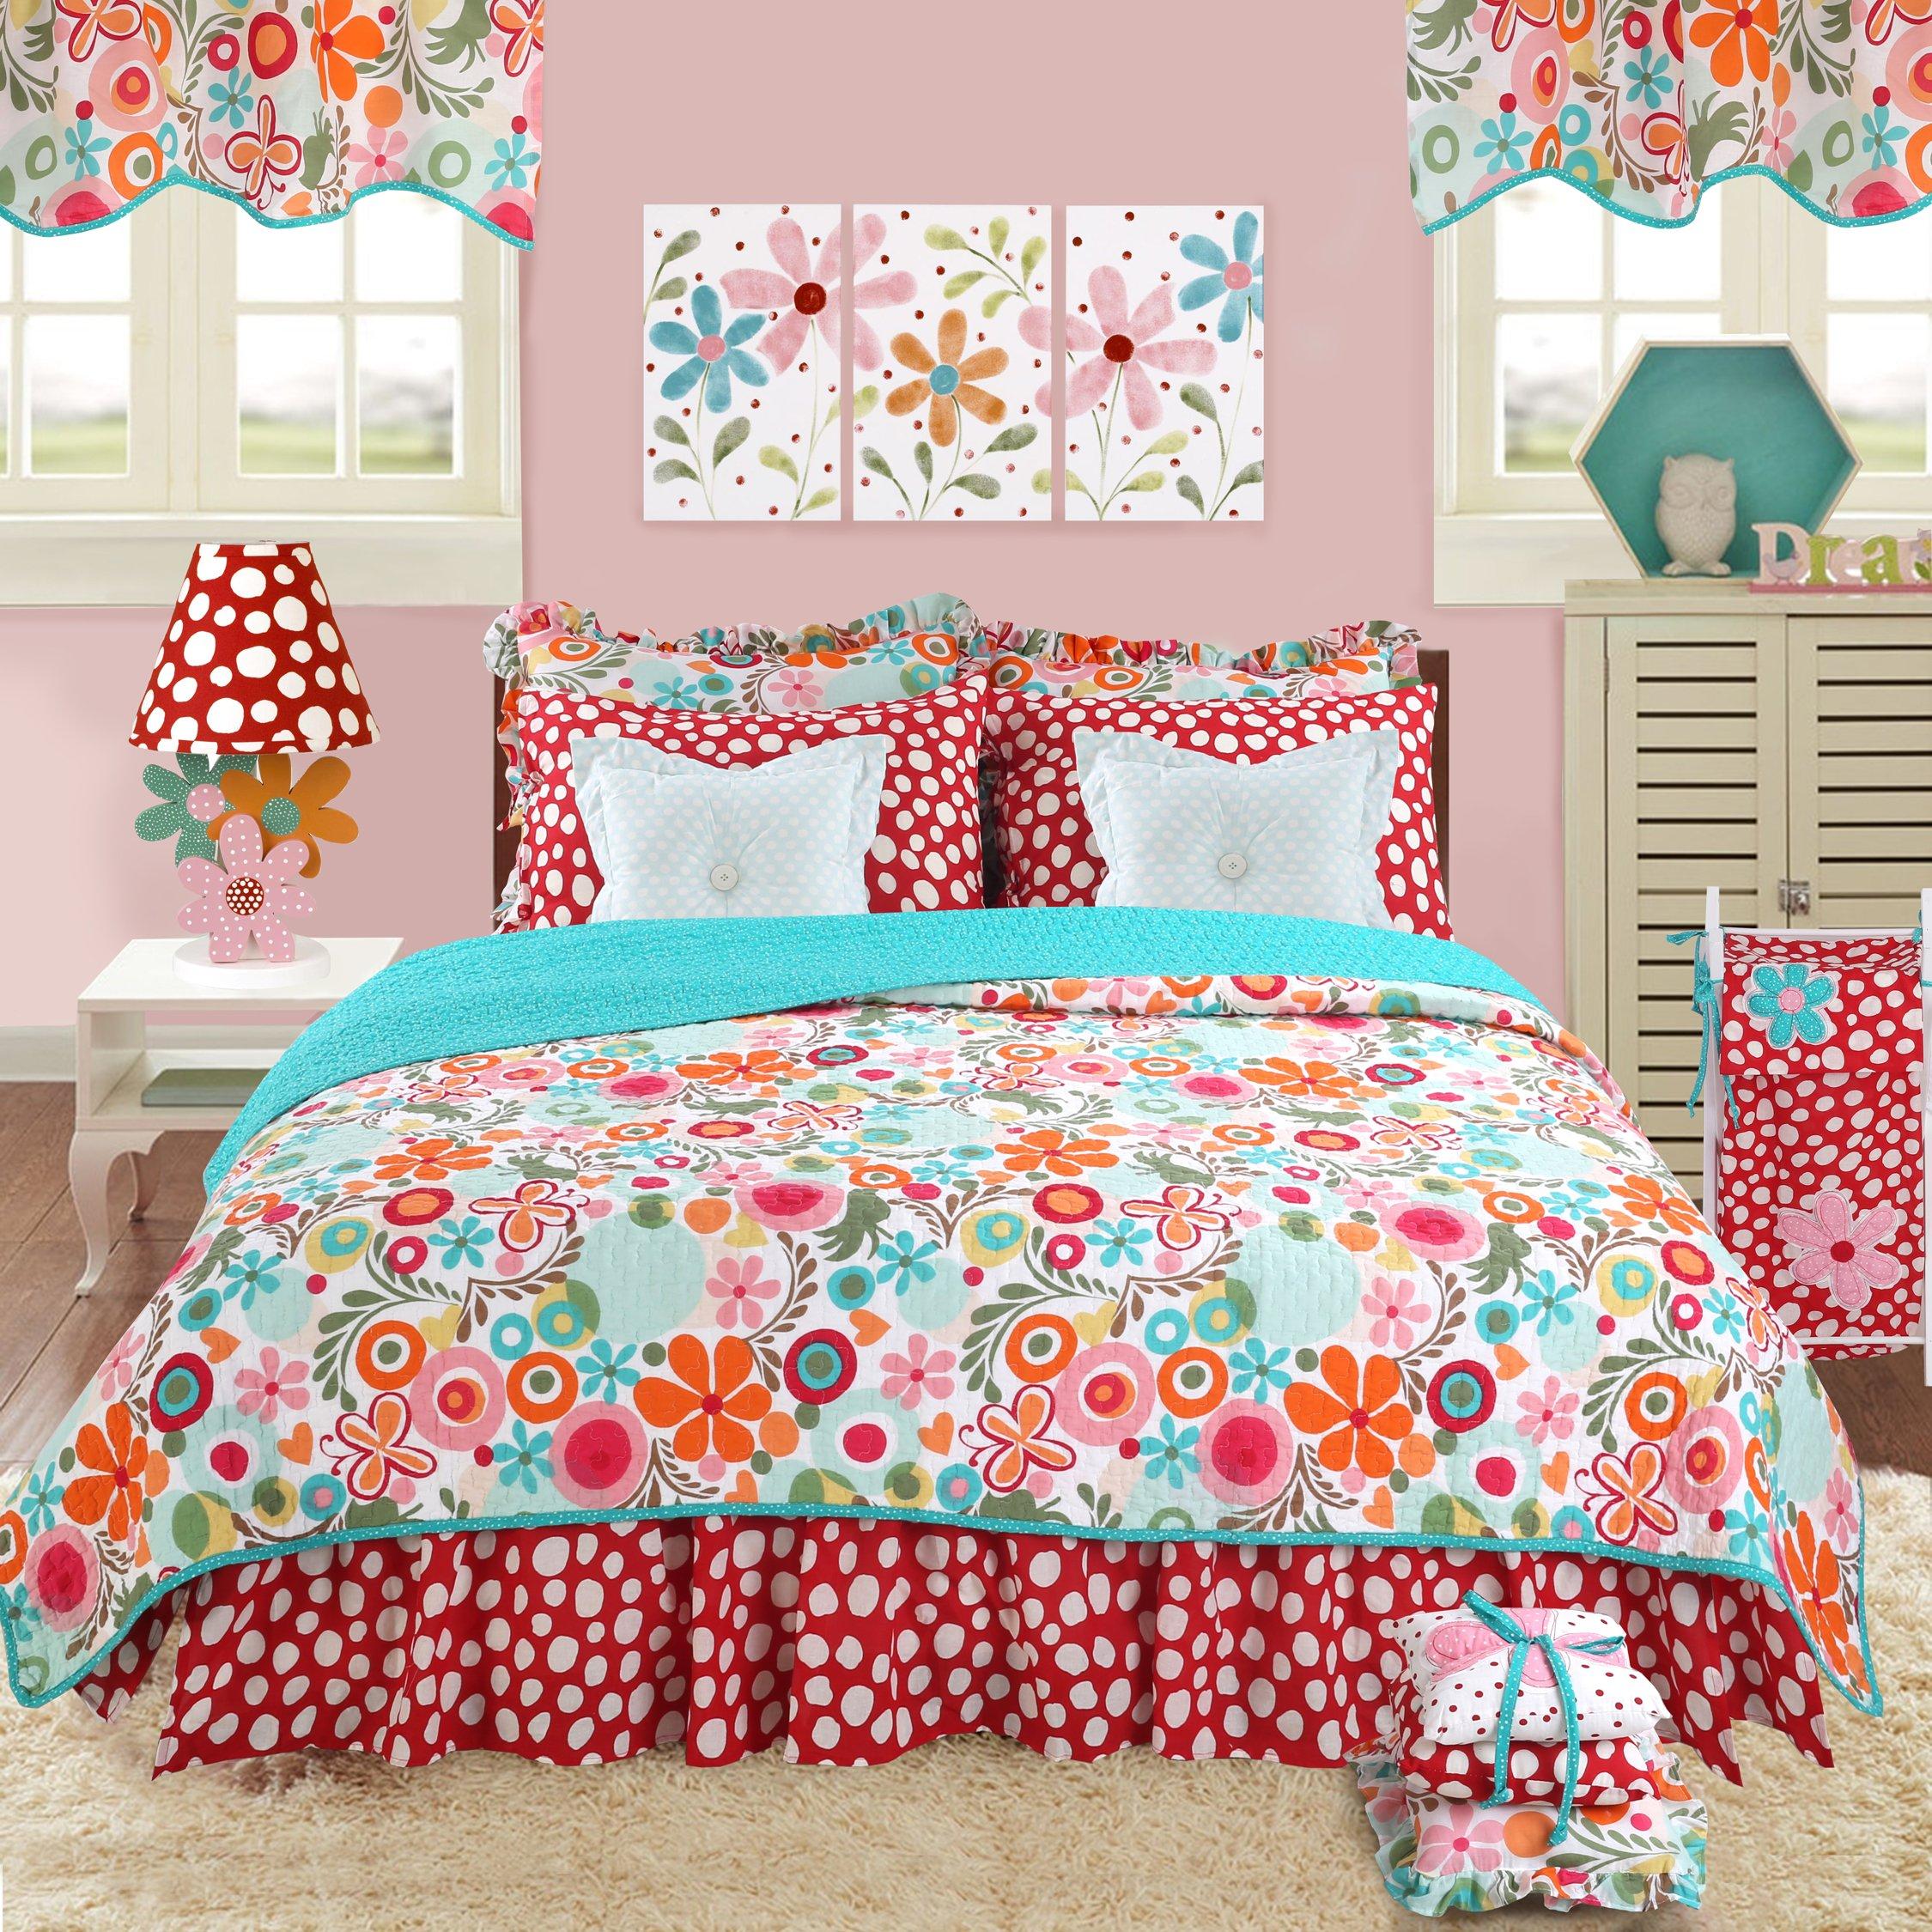 Cotton Tale Designs 100% Cotton Colorful Contemporary Fun Bright Floral & Polka Dots 2 Piece Twin Quilt Bedding Set, Lizzie